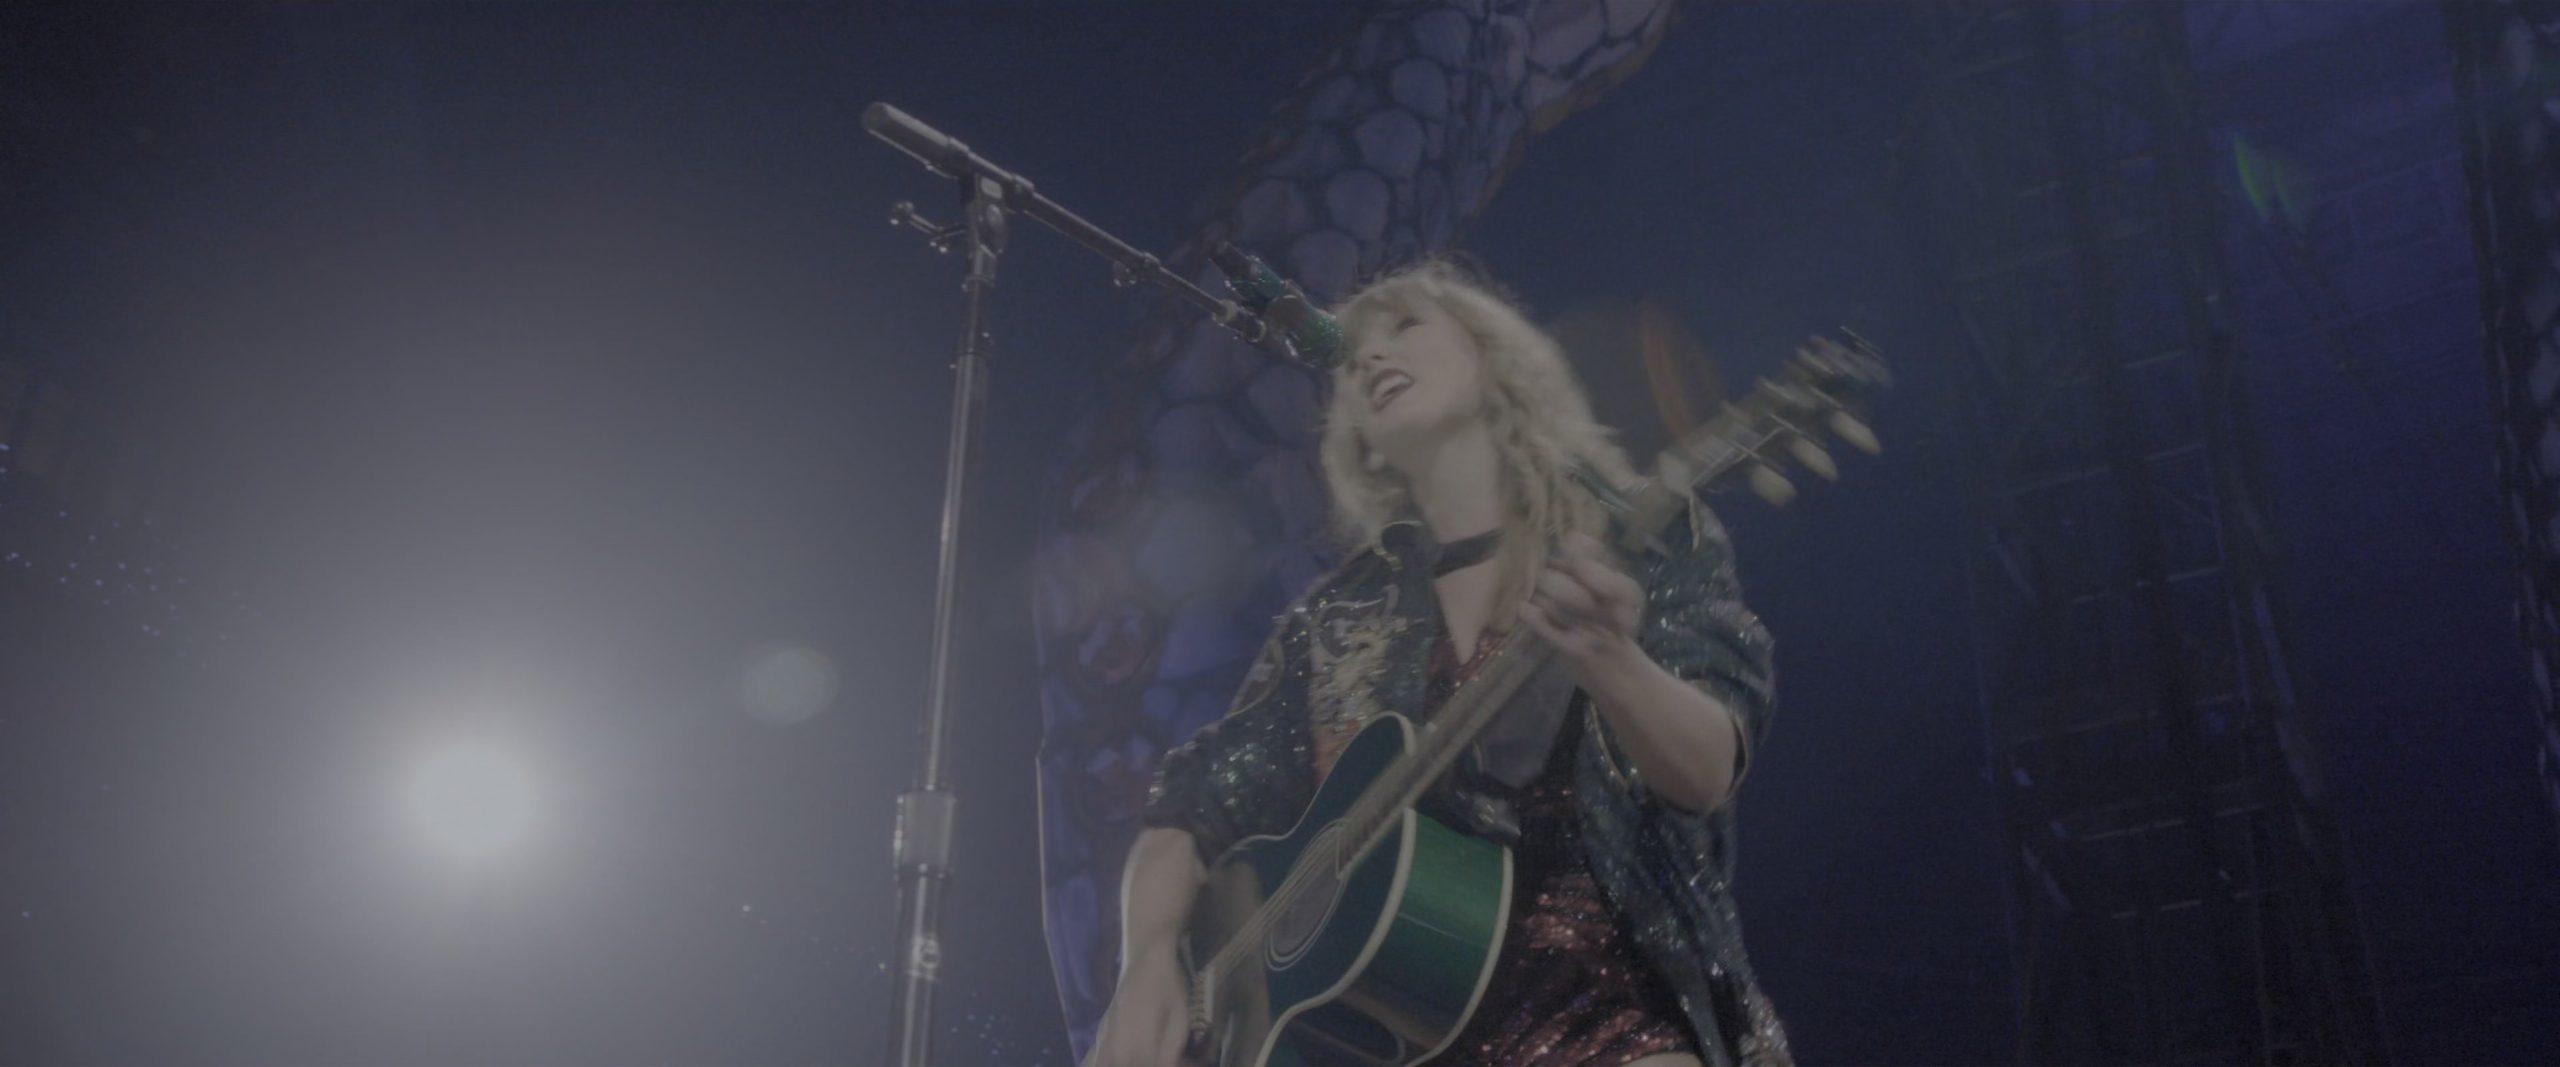 Taylor Swift - Reputation Stadium Tour (2018) 2160p HDR Netflix WEBRip DD+ Atmos 5.1 x265-TrollUHD.mkv_20200301_141144.022